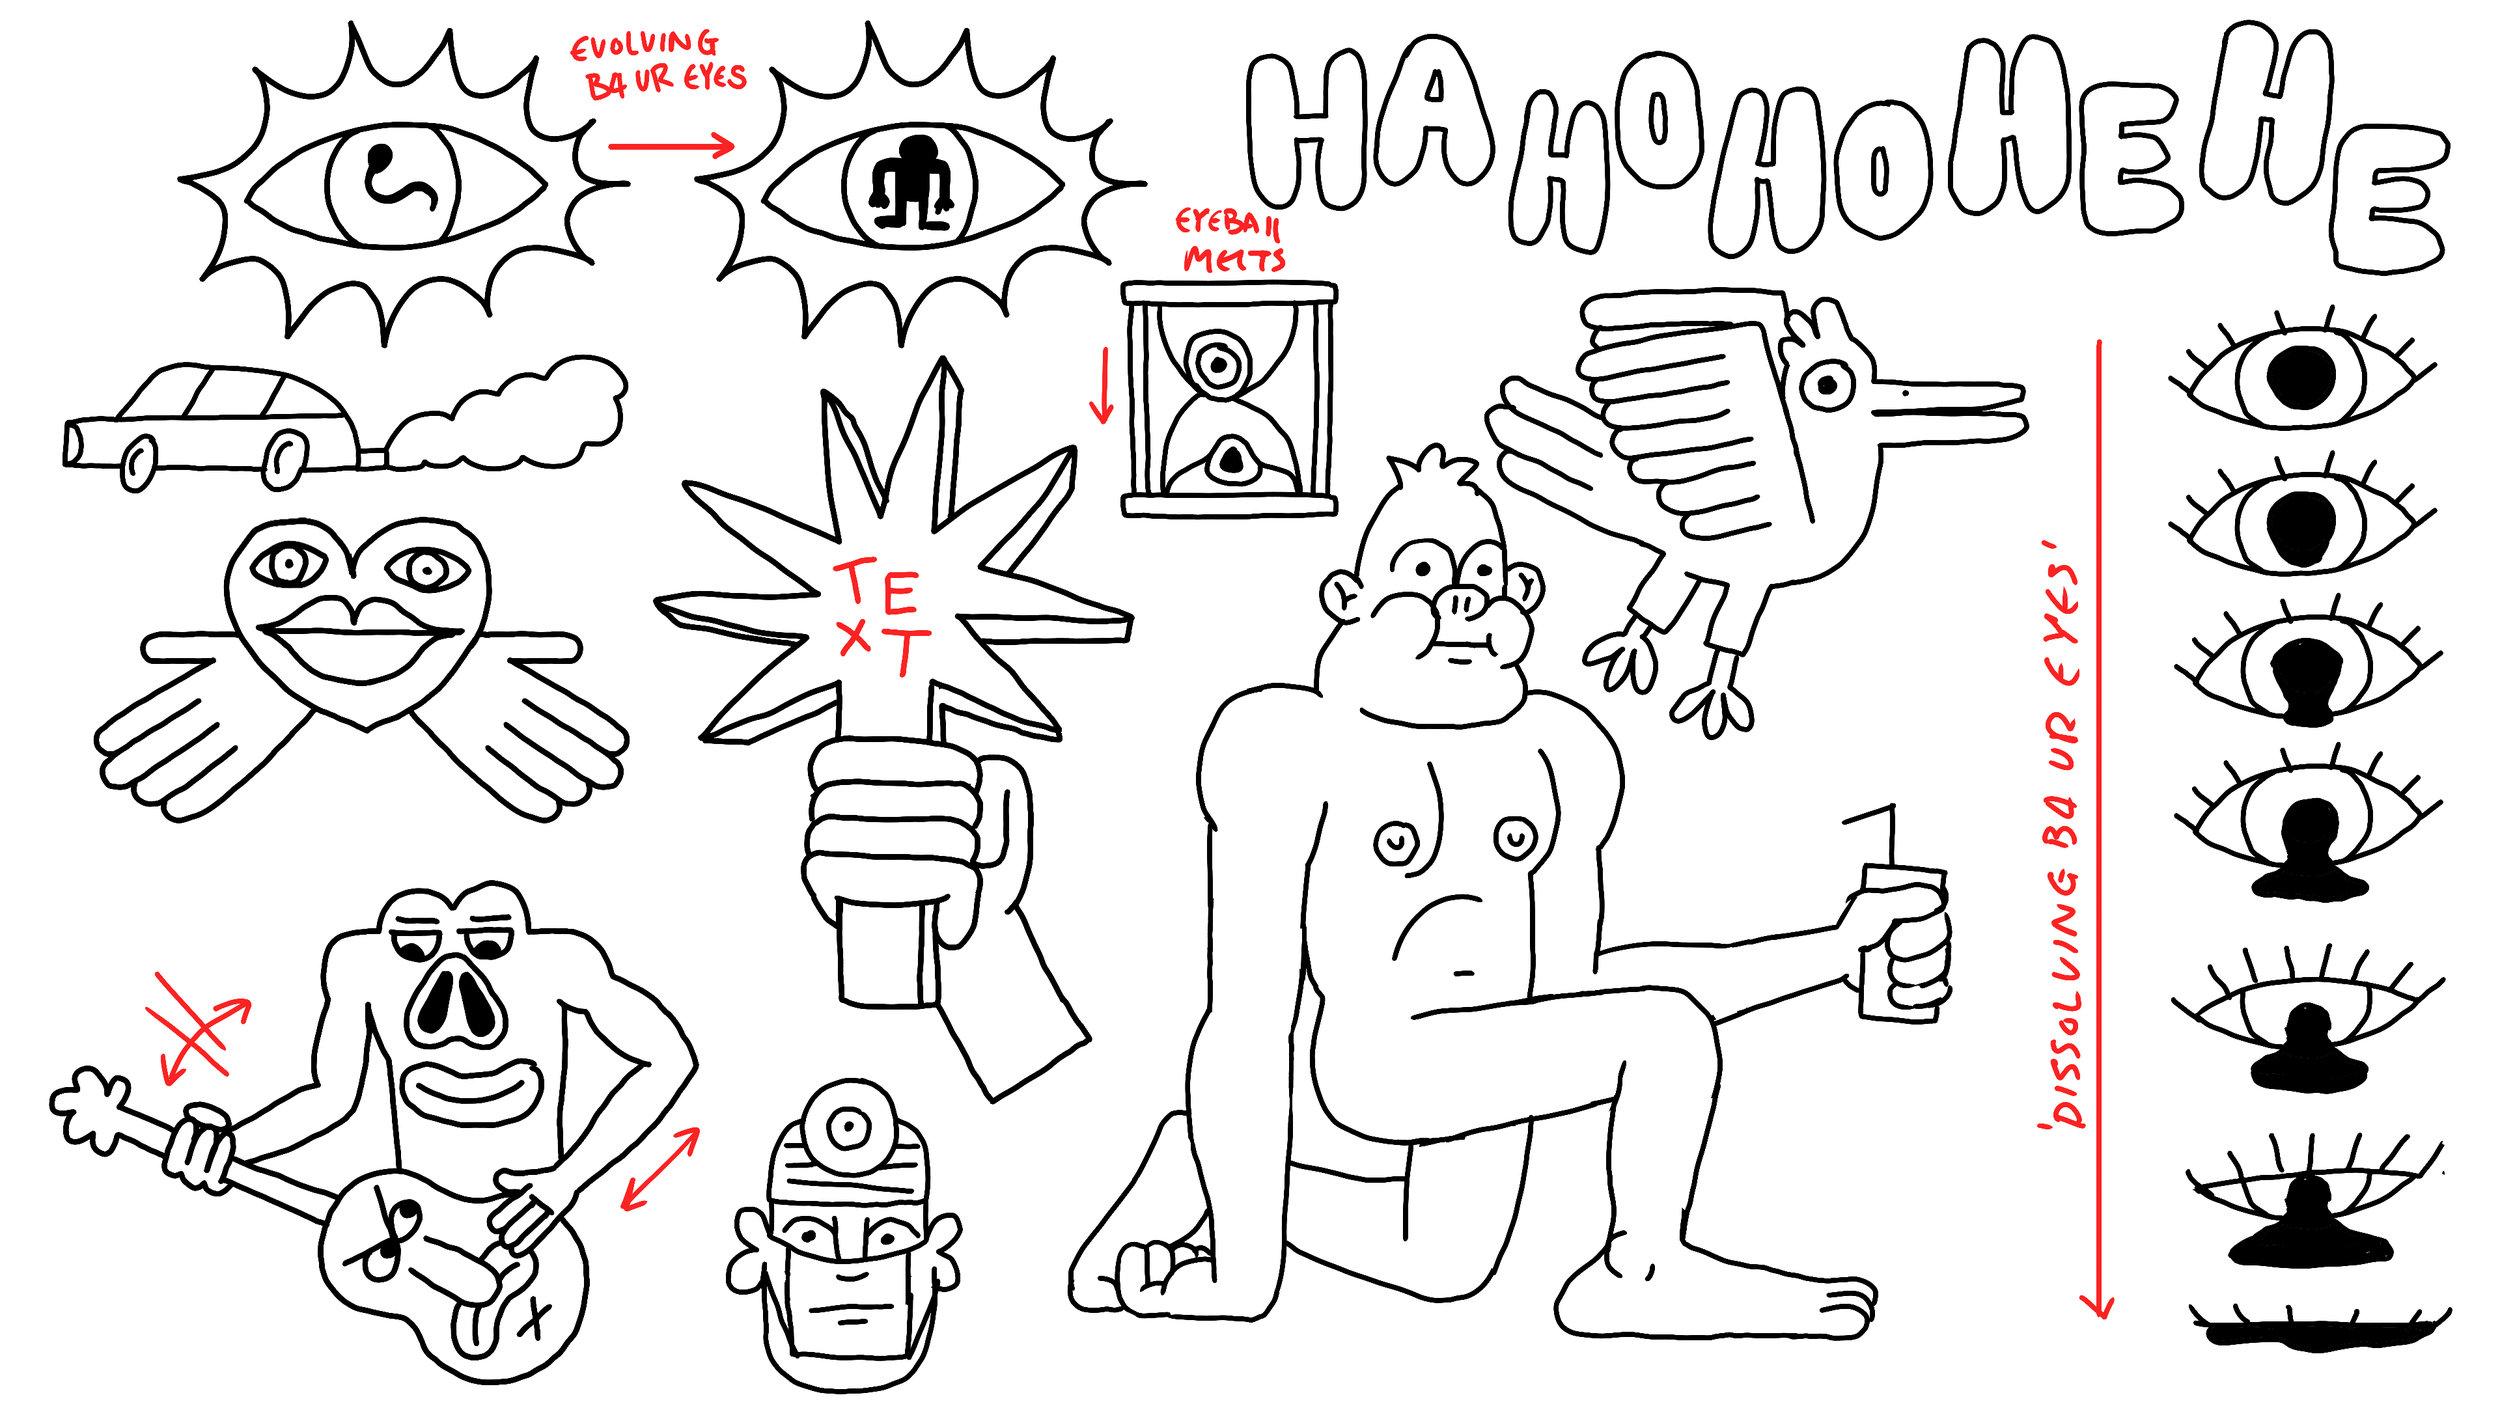 doodles01.jpg